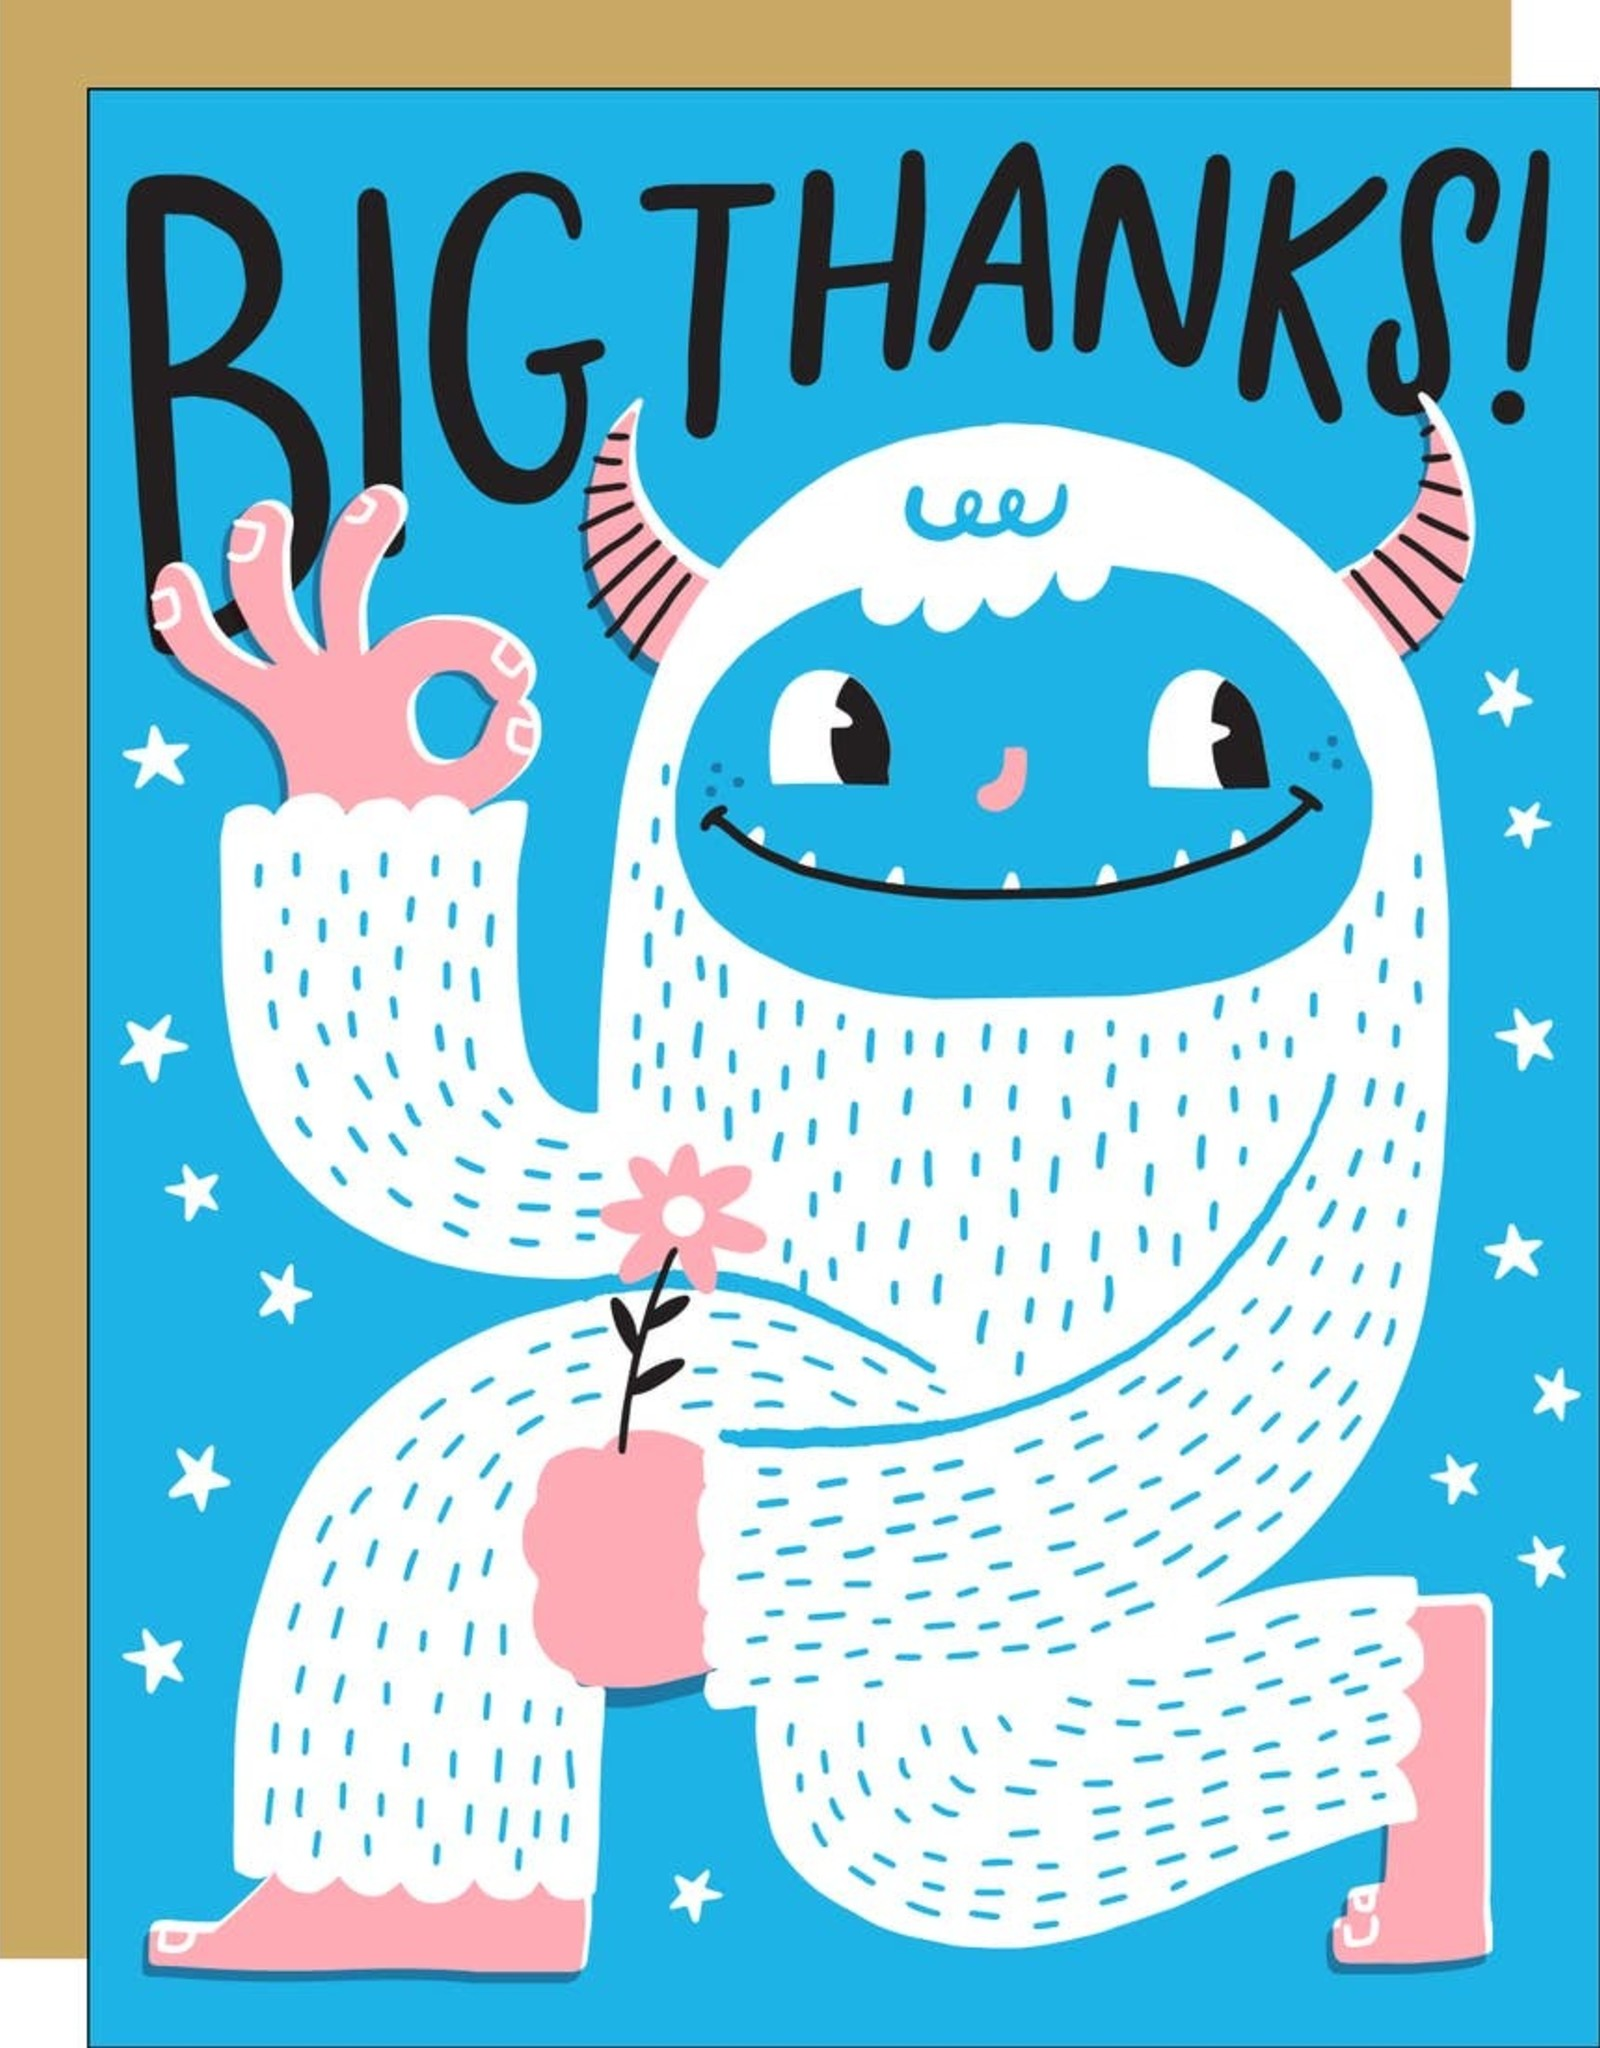 Card - Thank you: Big thanks